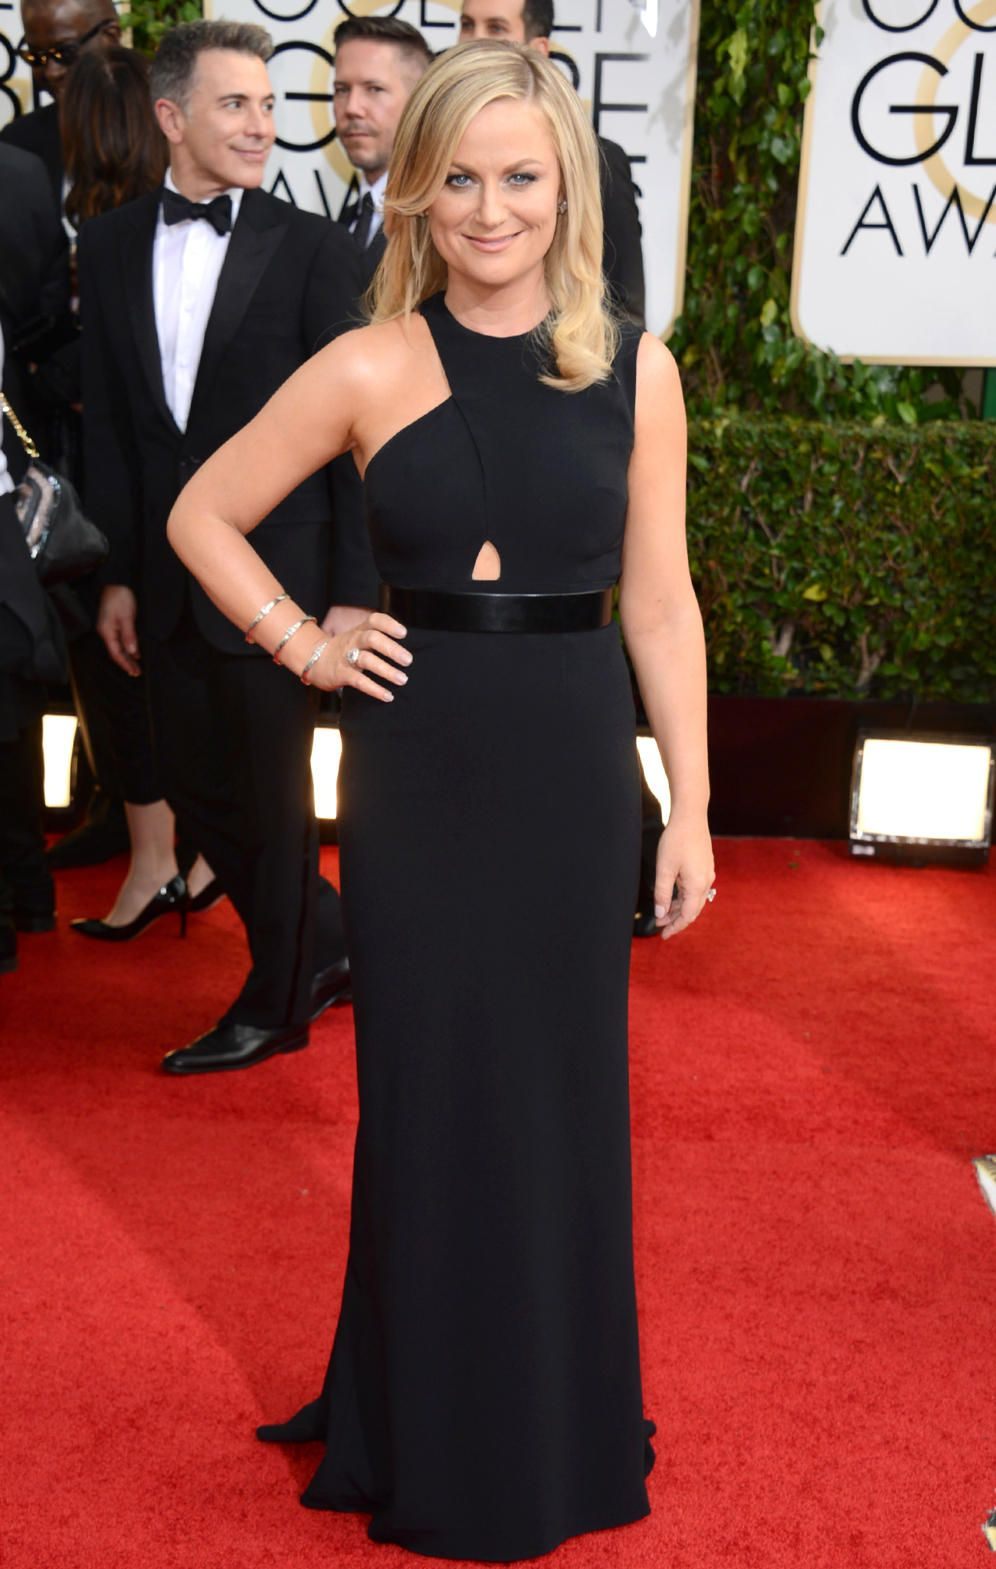 Amy Poehler - Golden Globes 2014